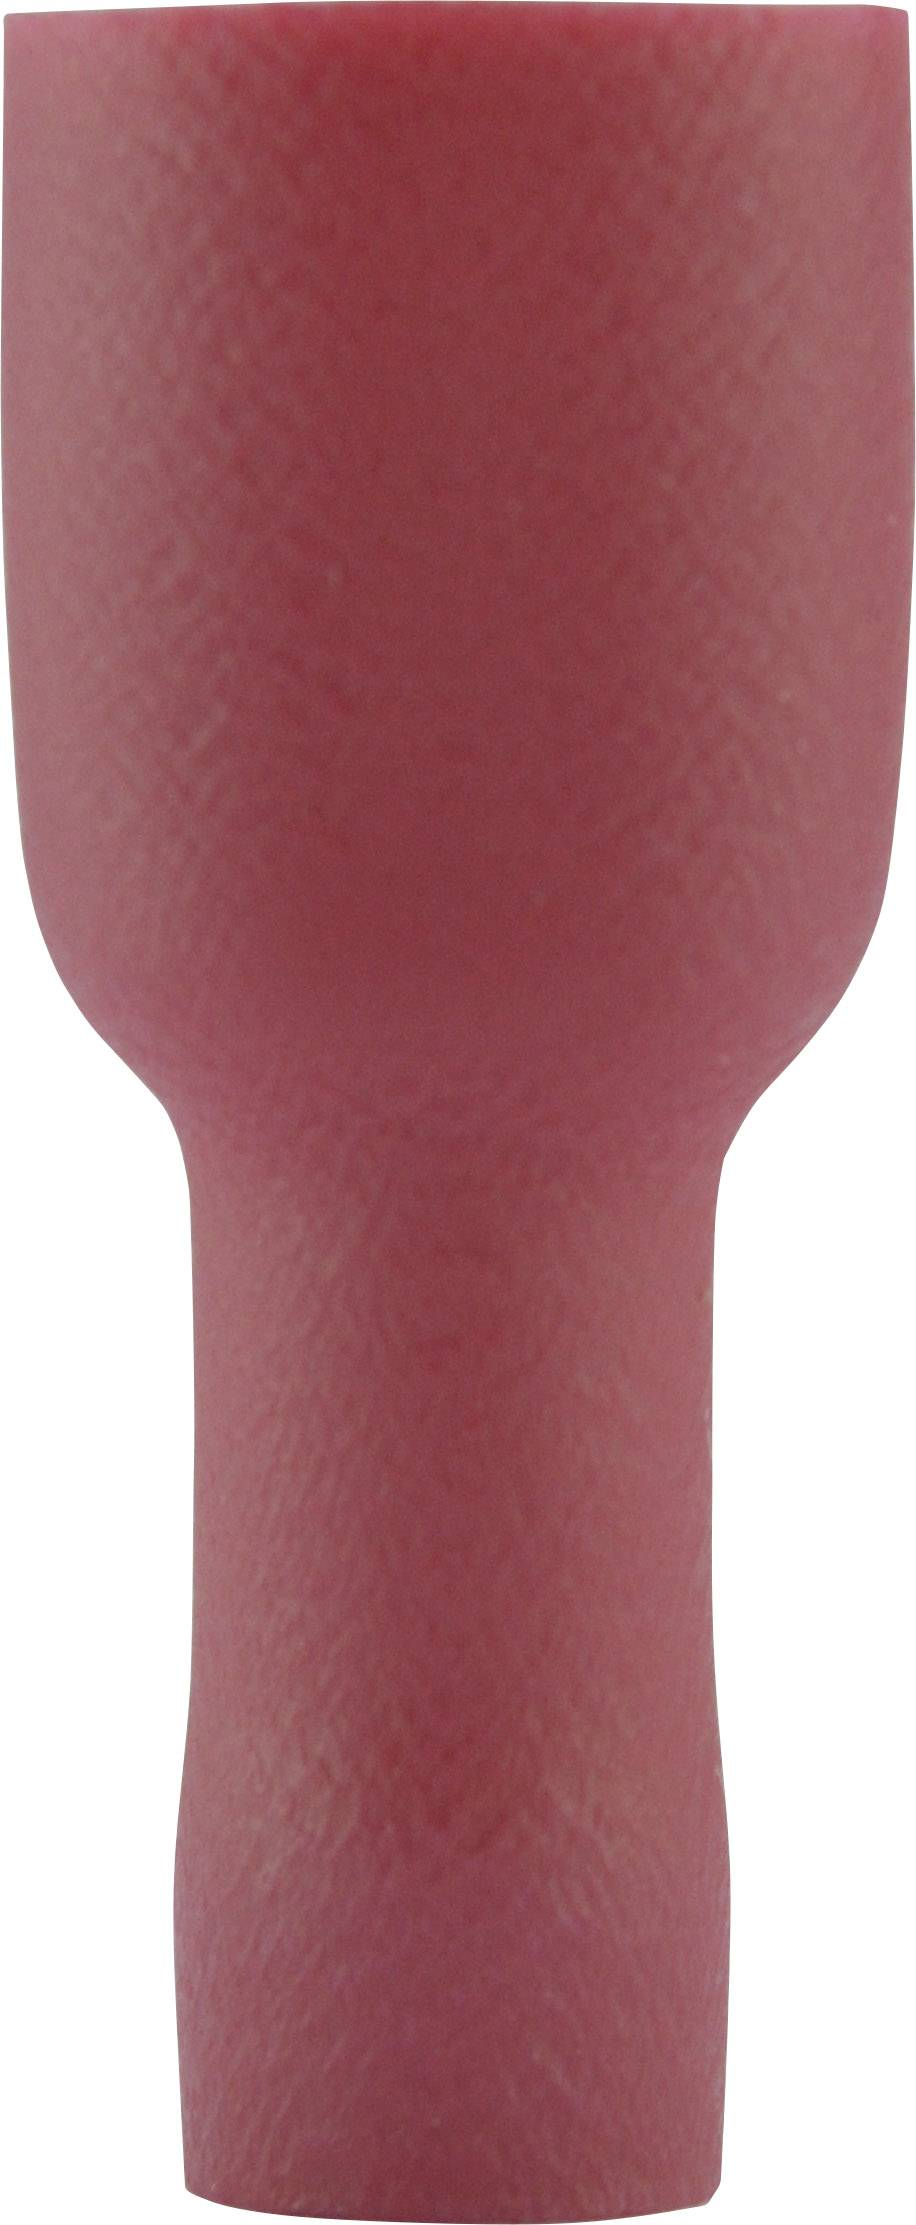 Faston zásuvka Vogt Verbindungstechnik 396108 4.8 mm x 0.8 mm, 180 °, plná izolace, červená, 1 ks